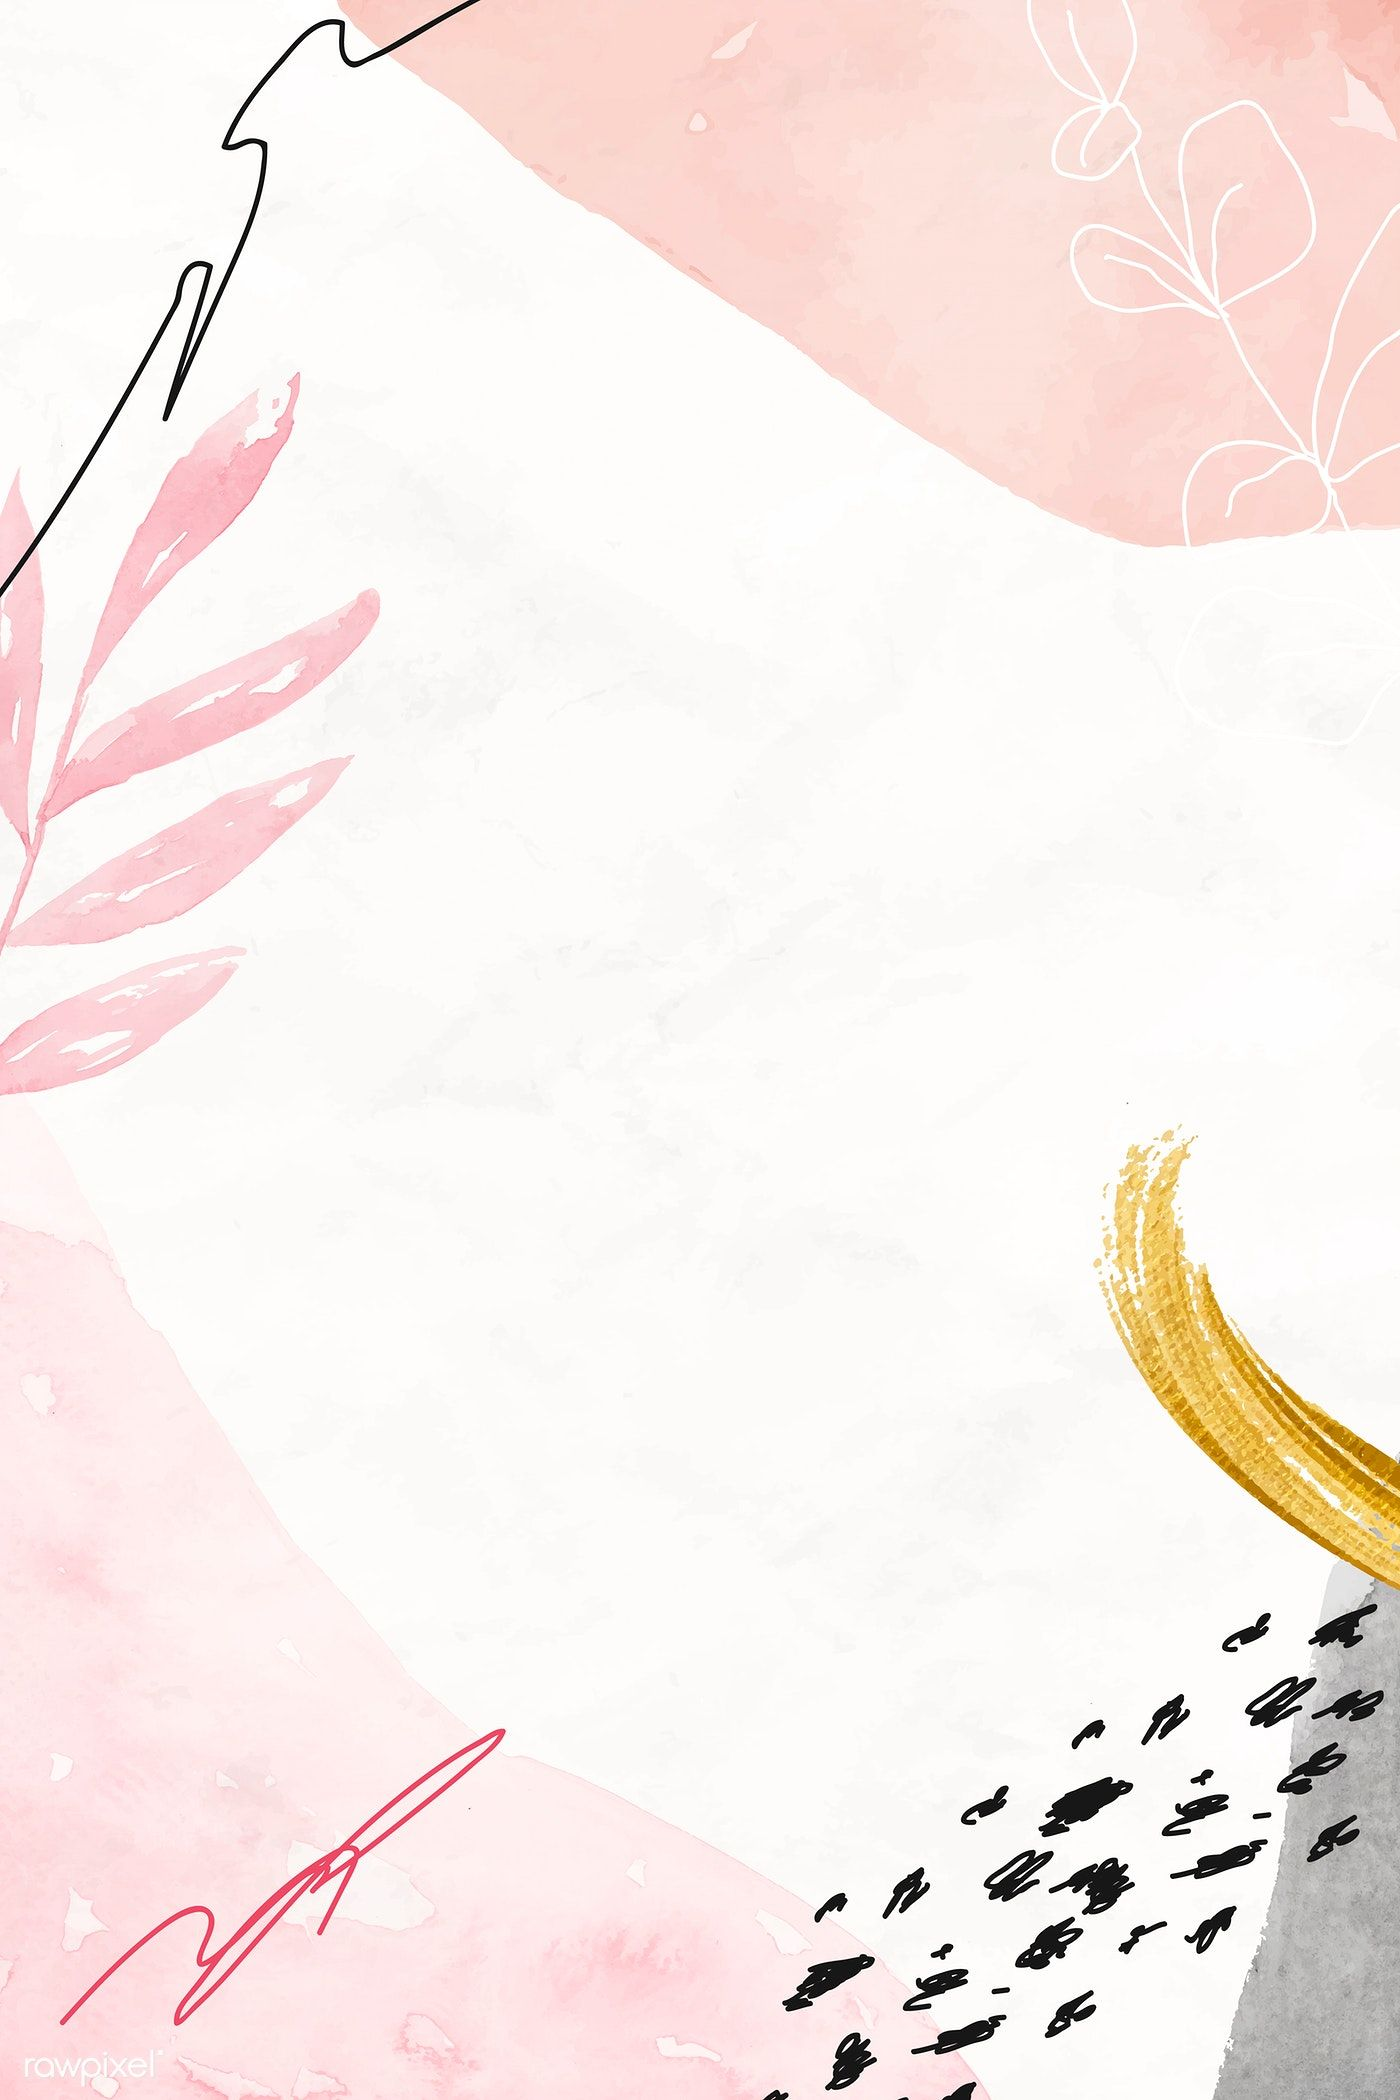 Download premium vector of Pink watercolor floral